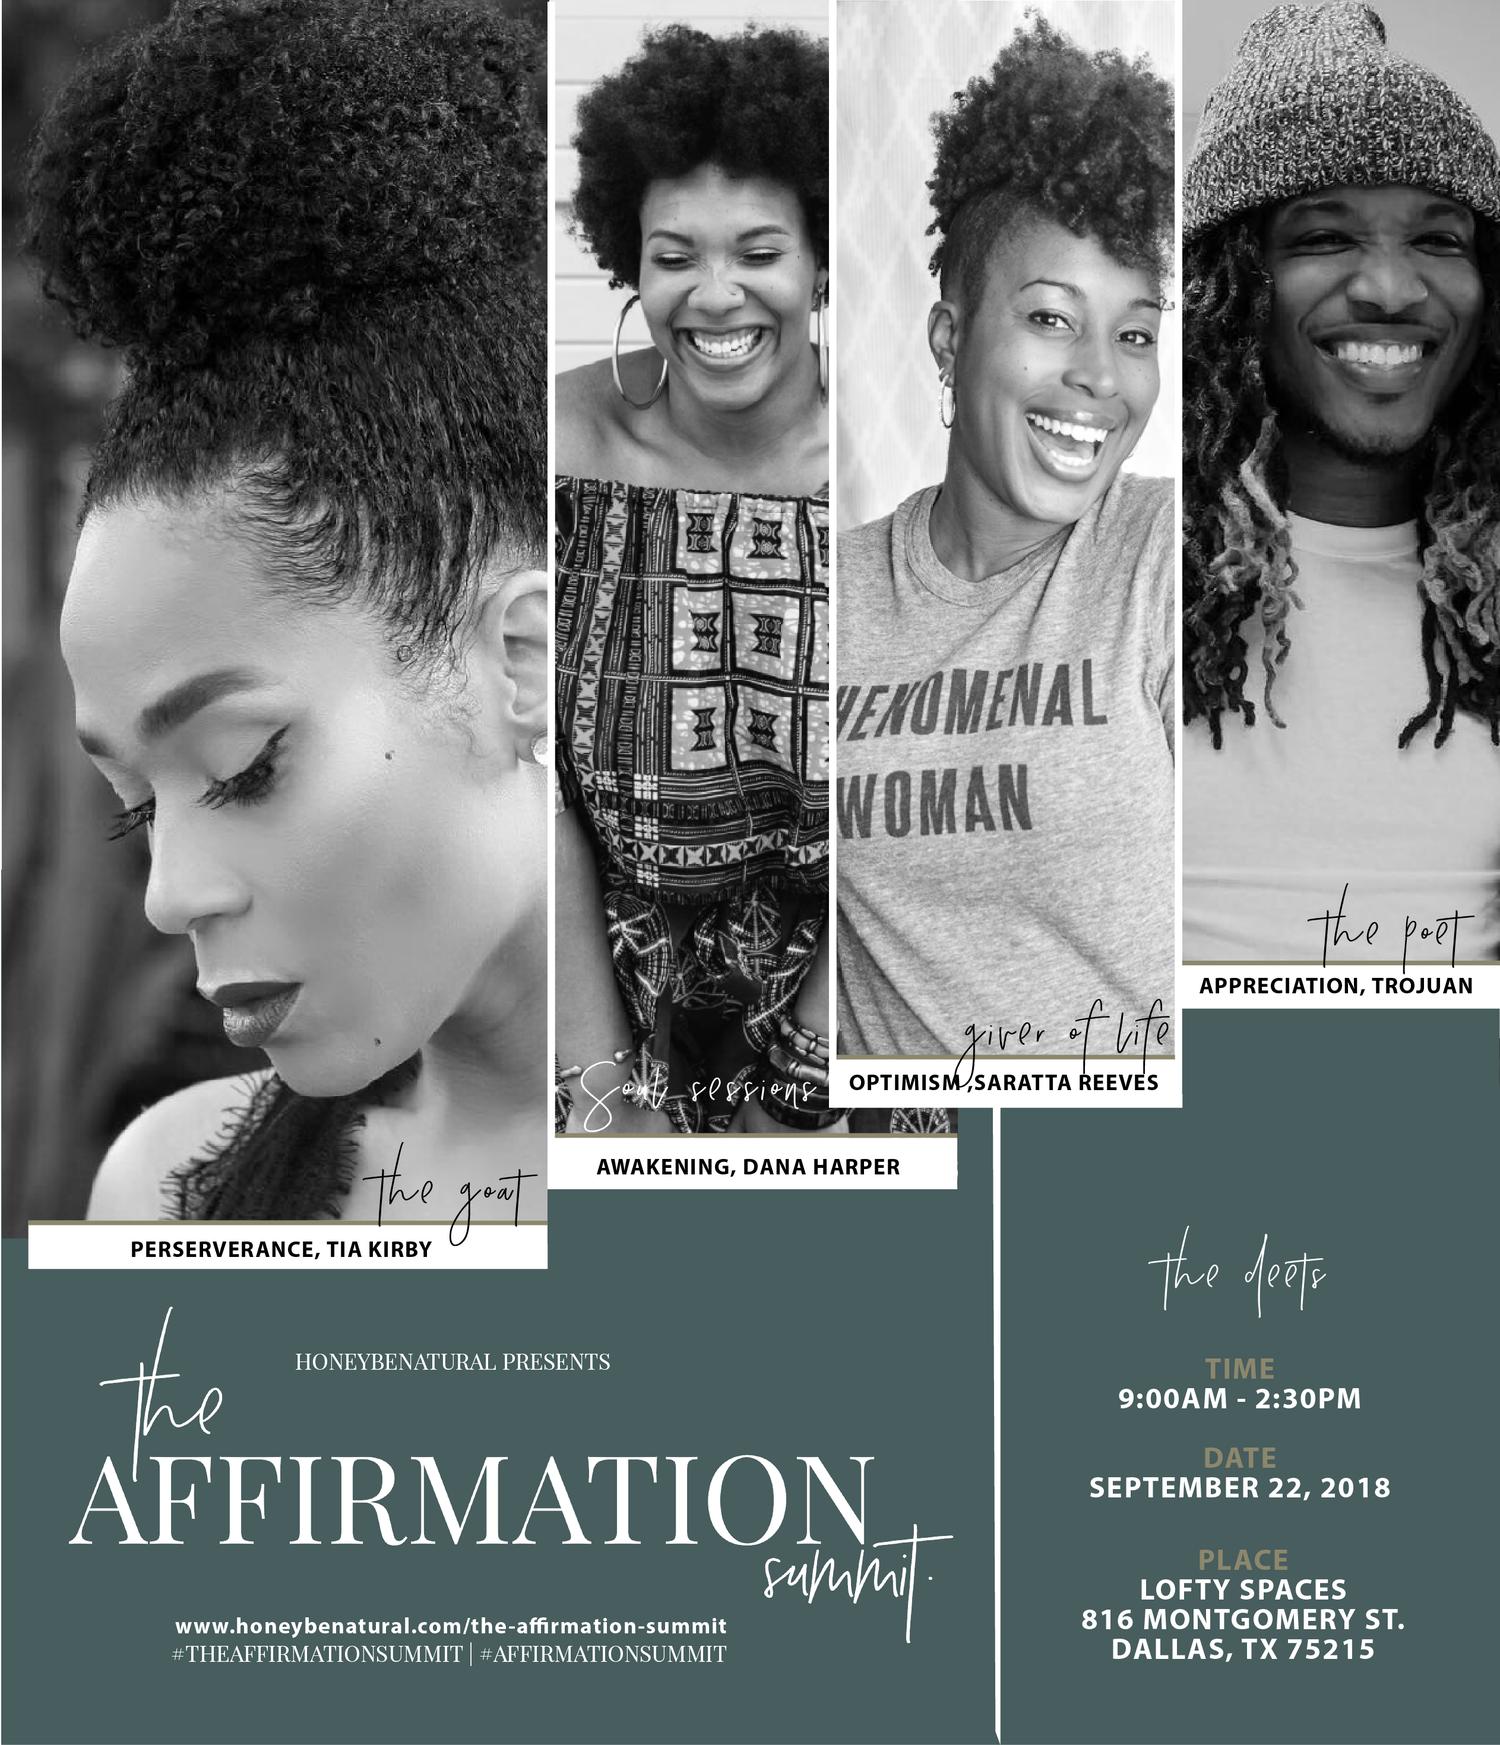 AffirmationSummit_flyer-15.png